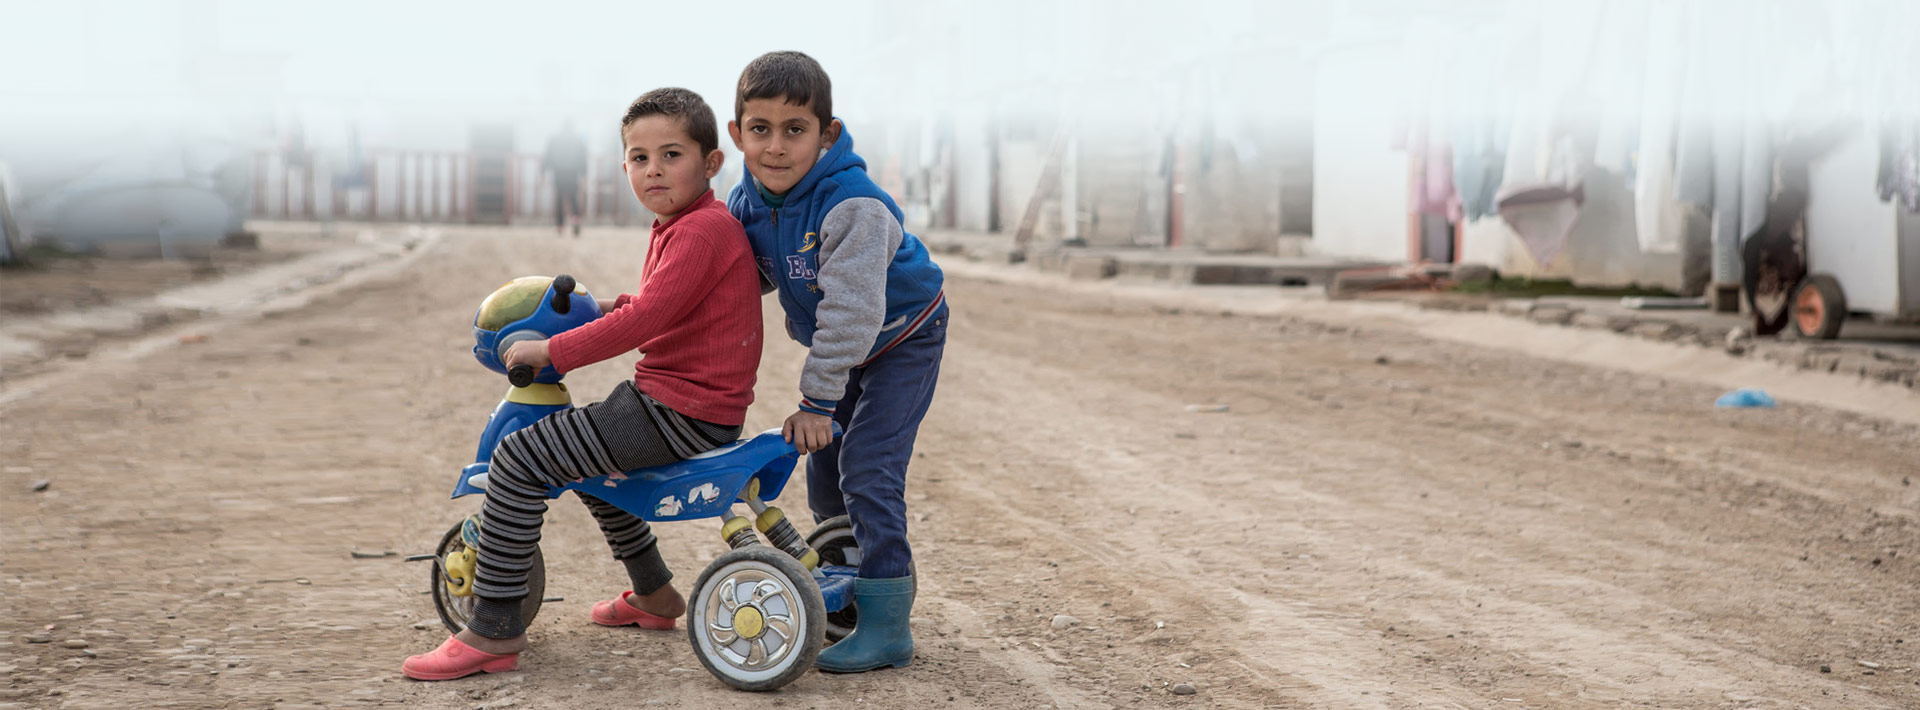 guerra-siria-dona-ahora